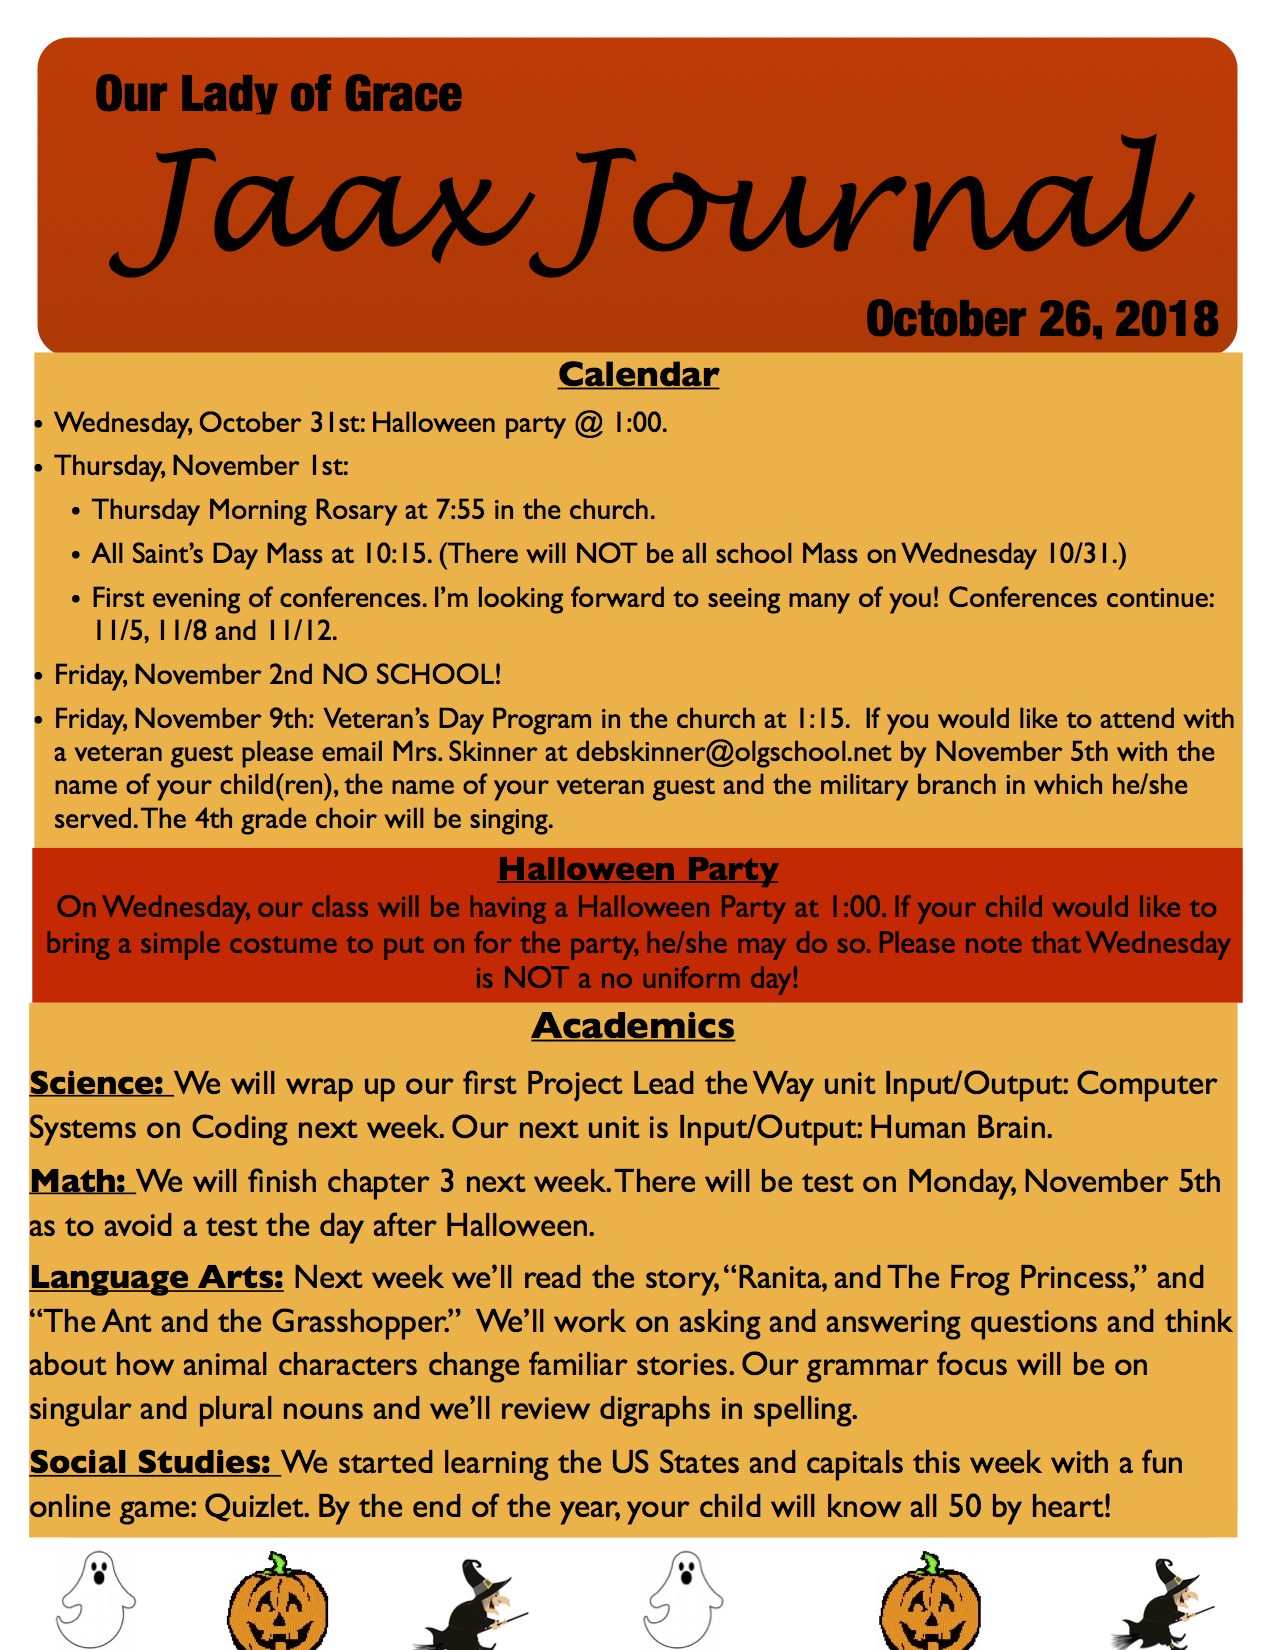 JaaxJournal10-26-18.jpg